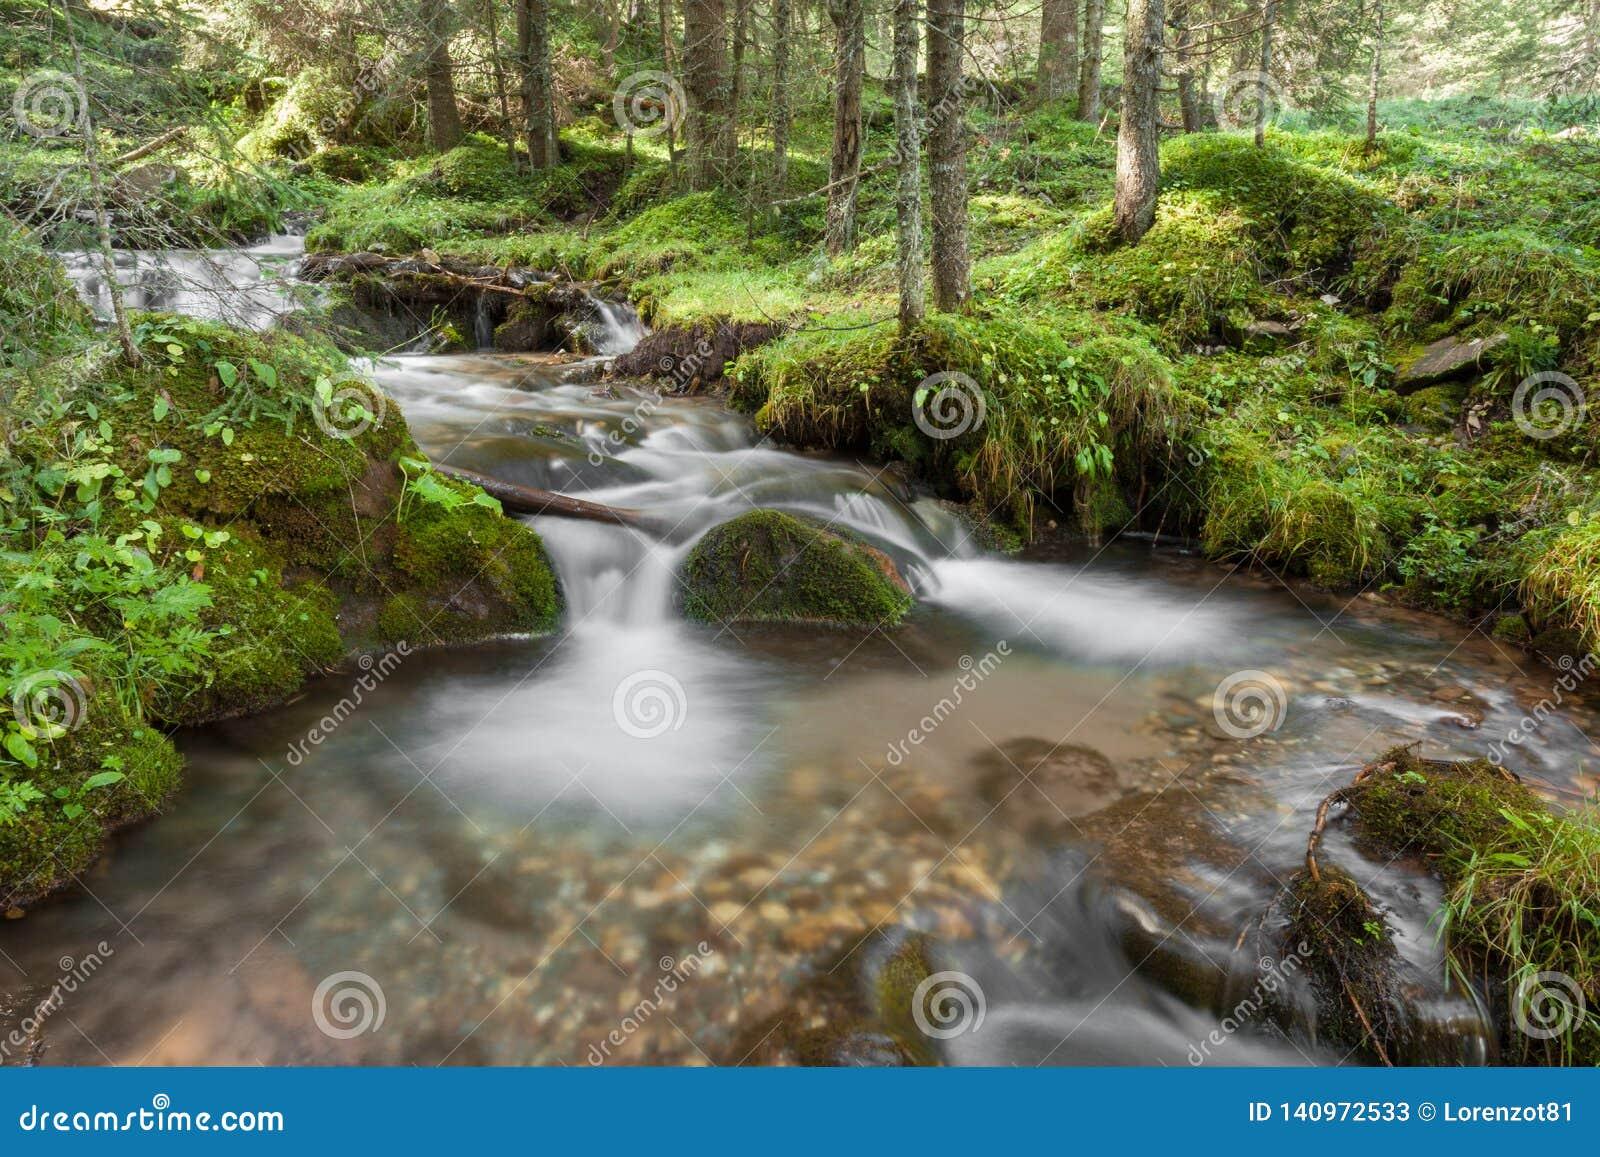 A stream flows inside the woods in Alto Adige